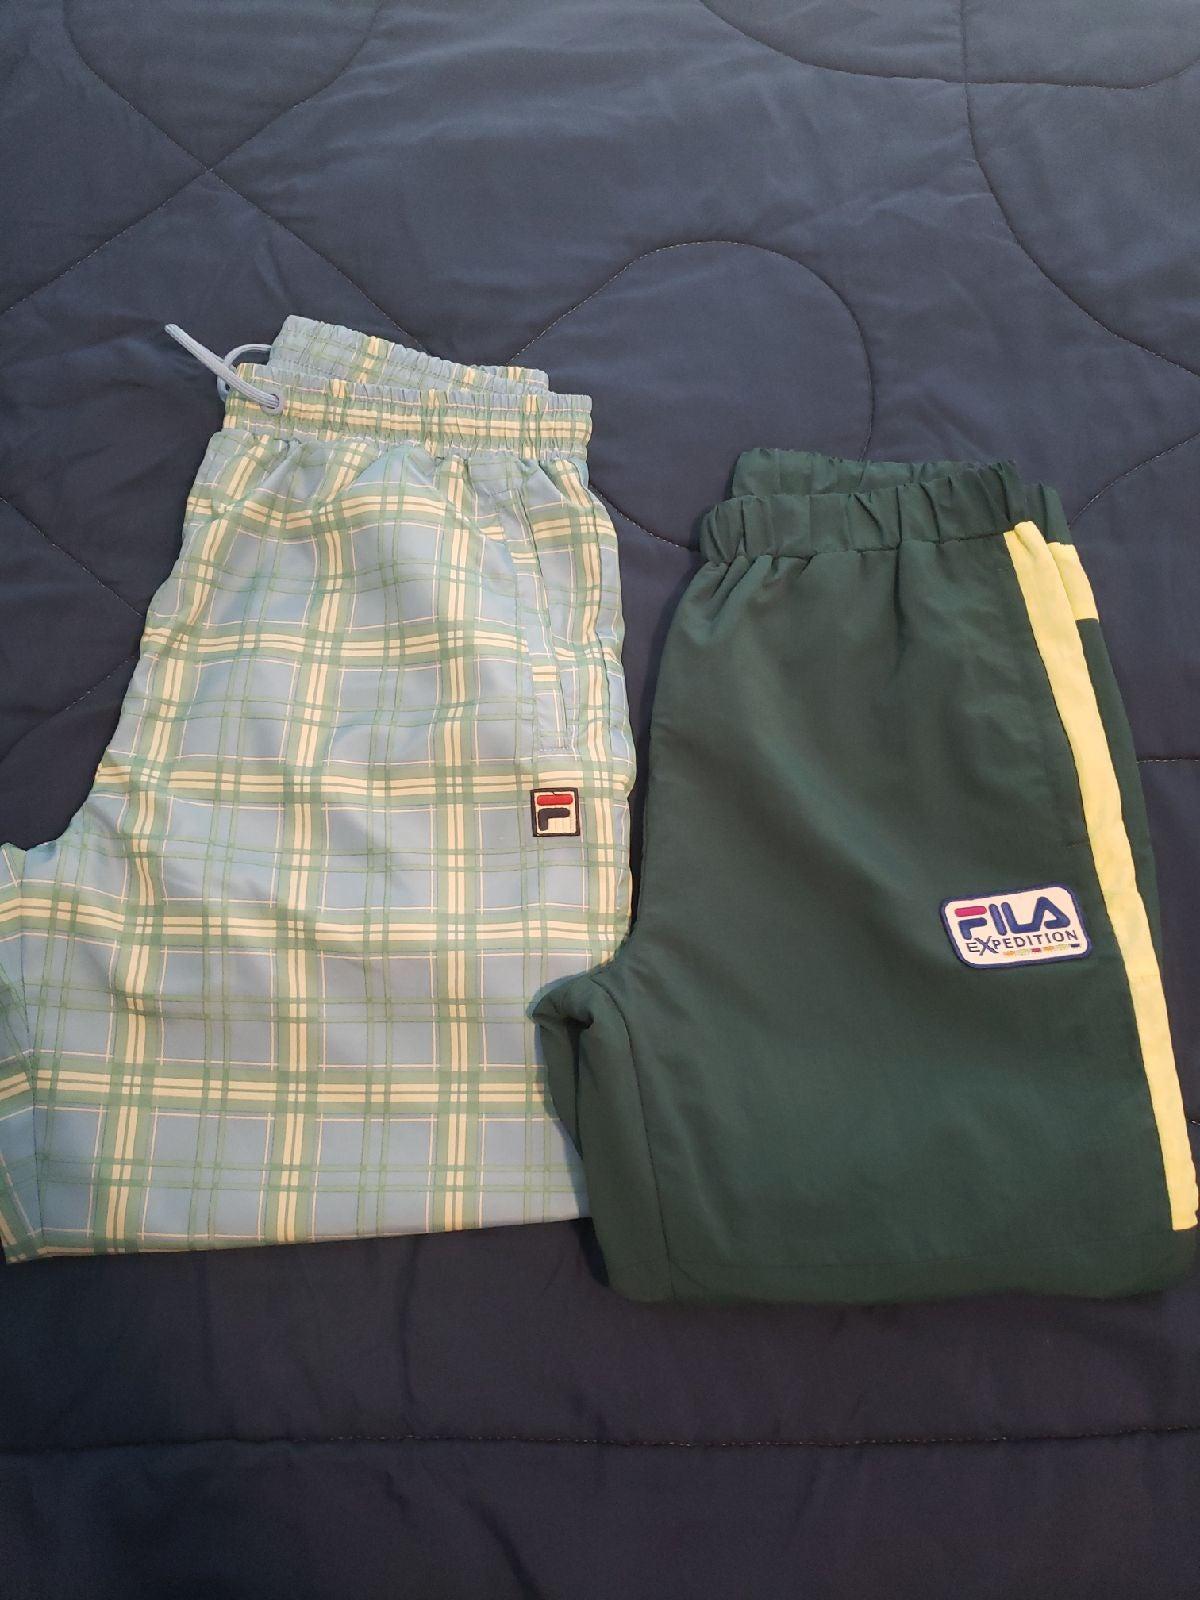 Fila track pants size medium